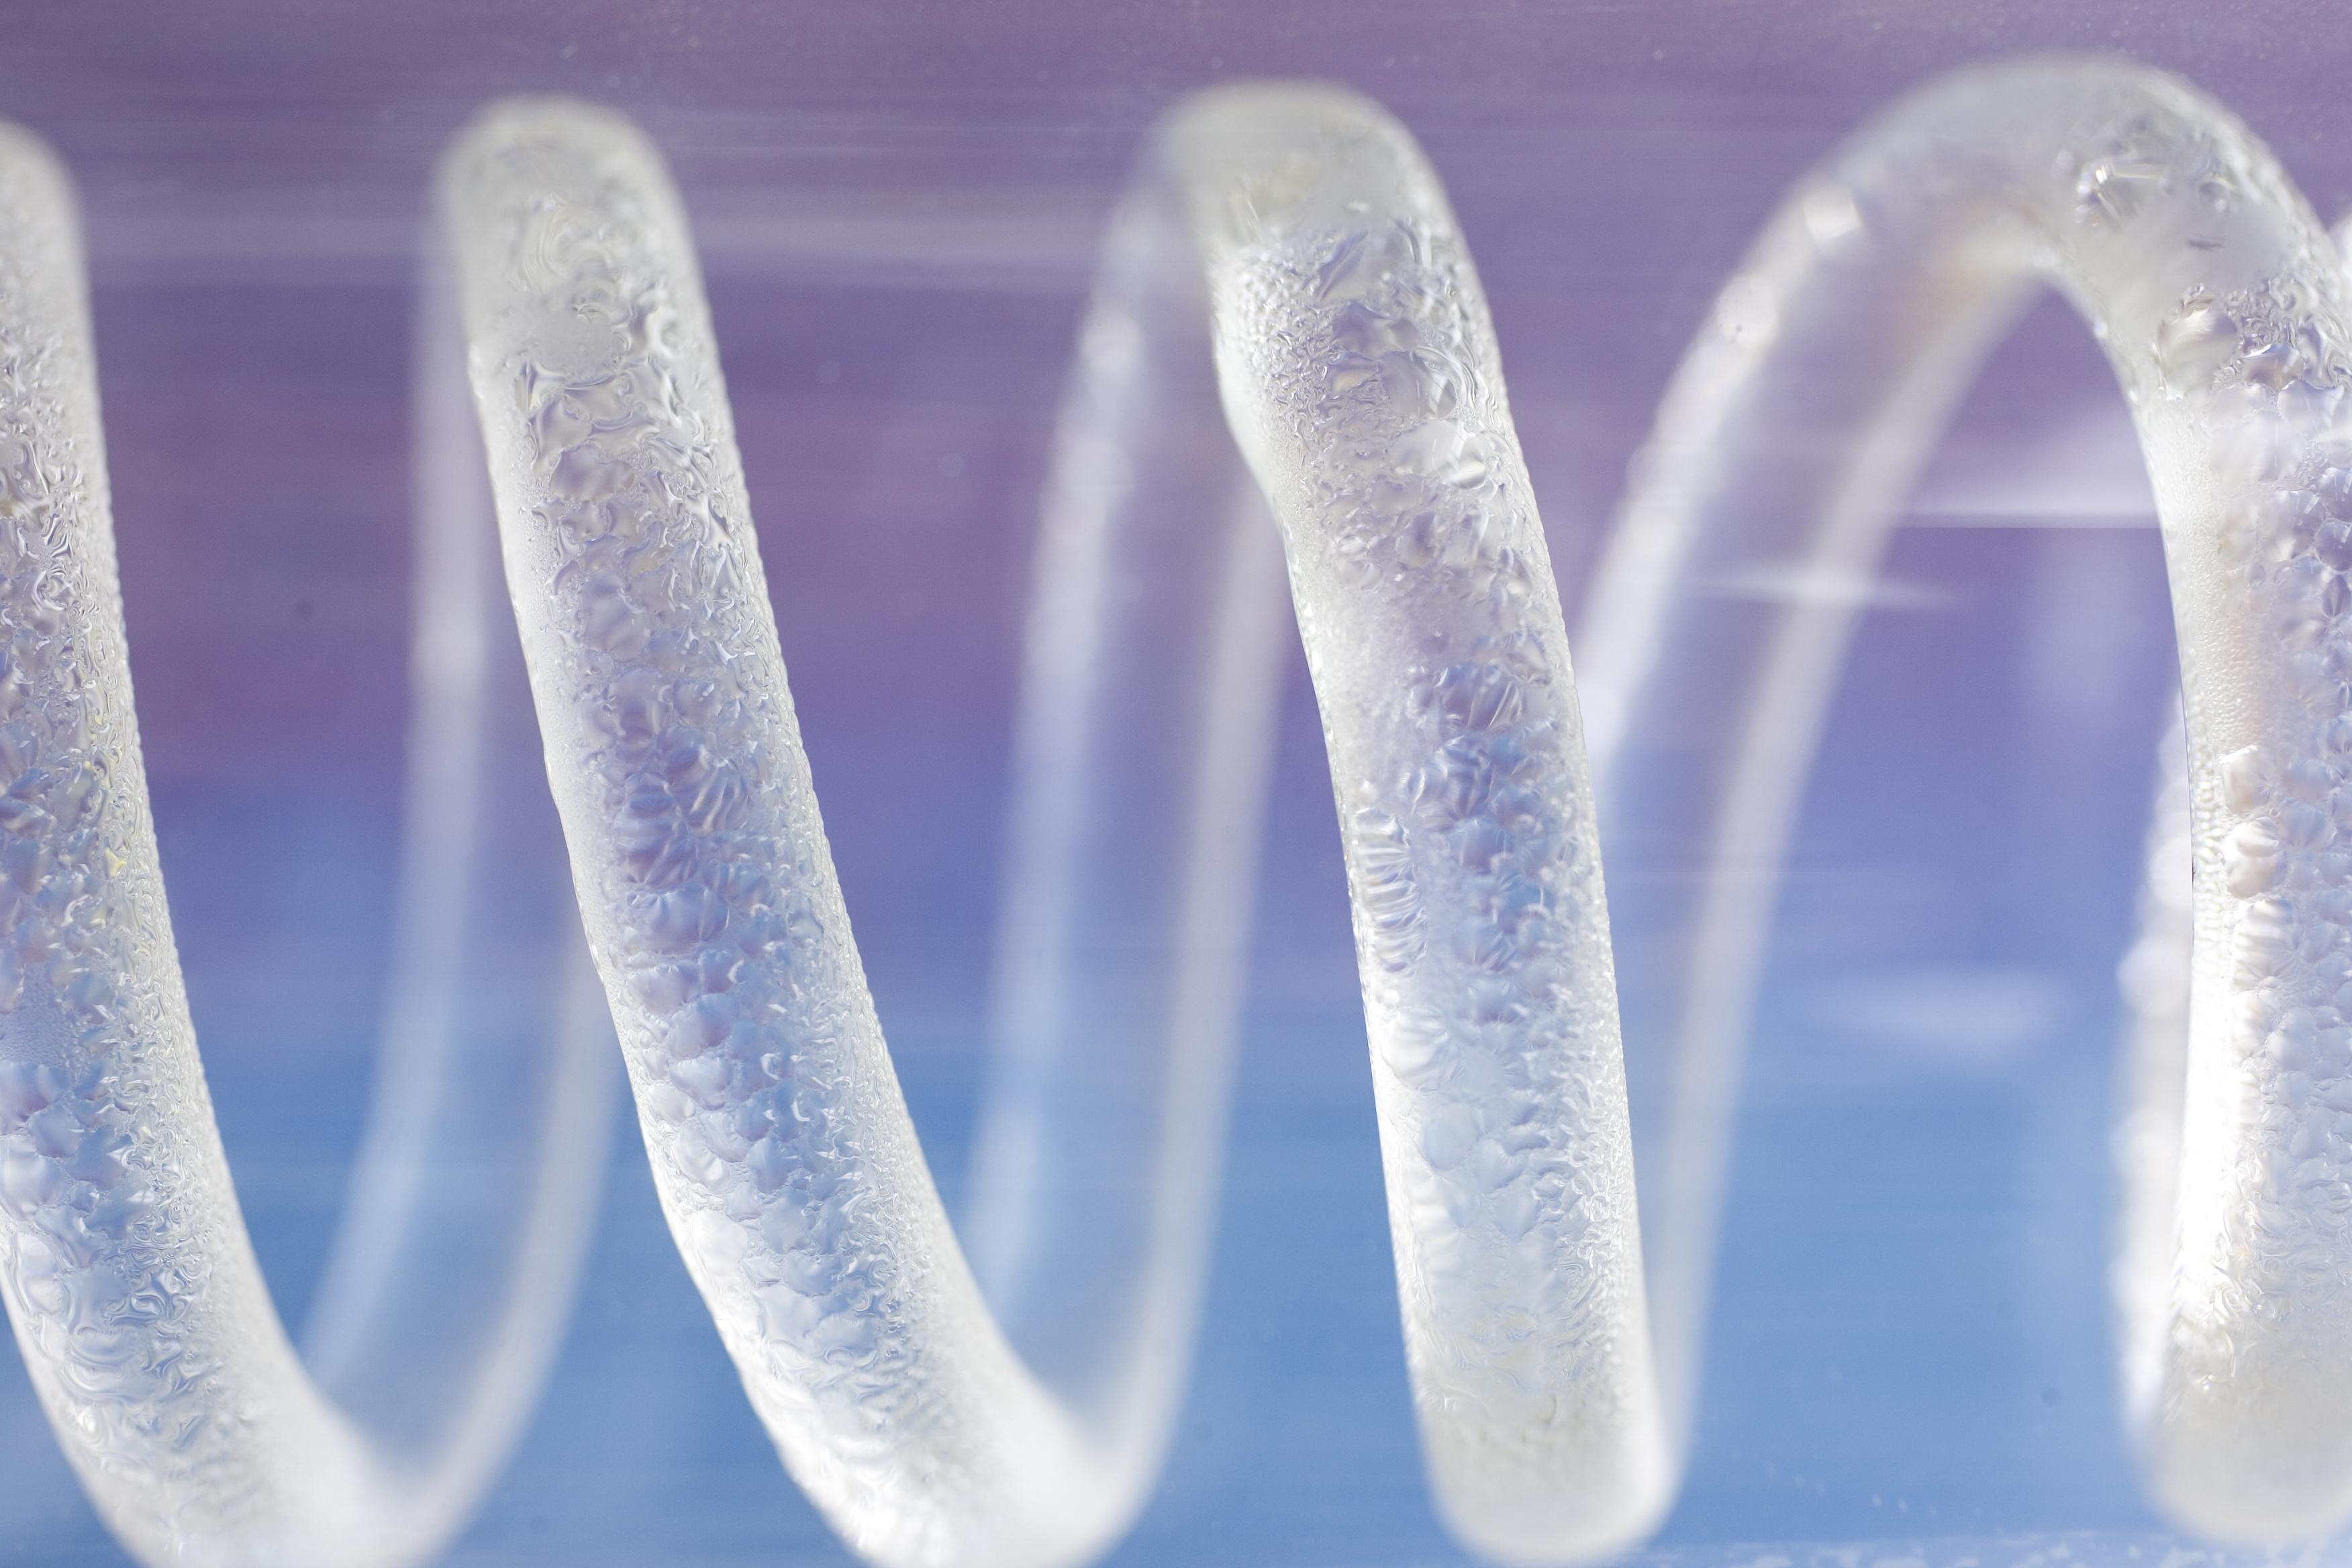 Spiral clear tube